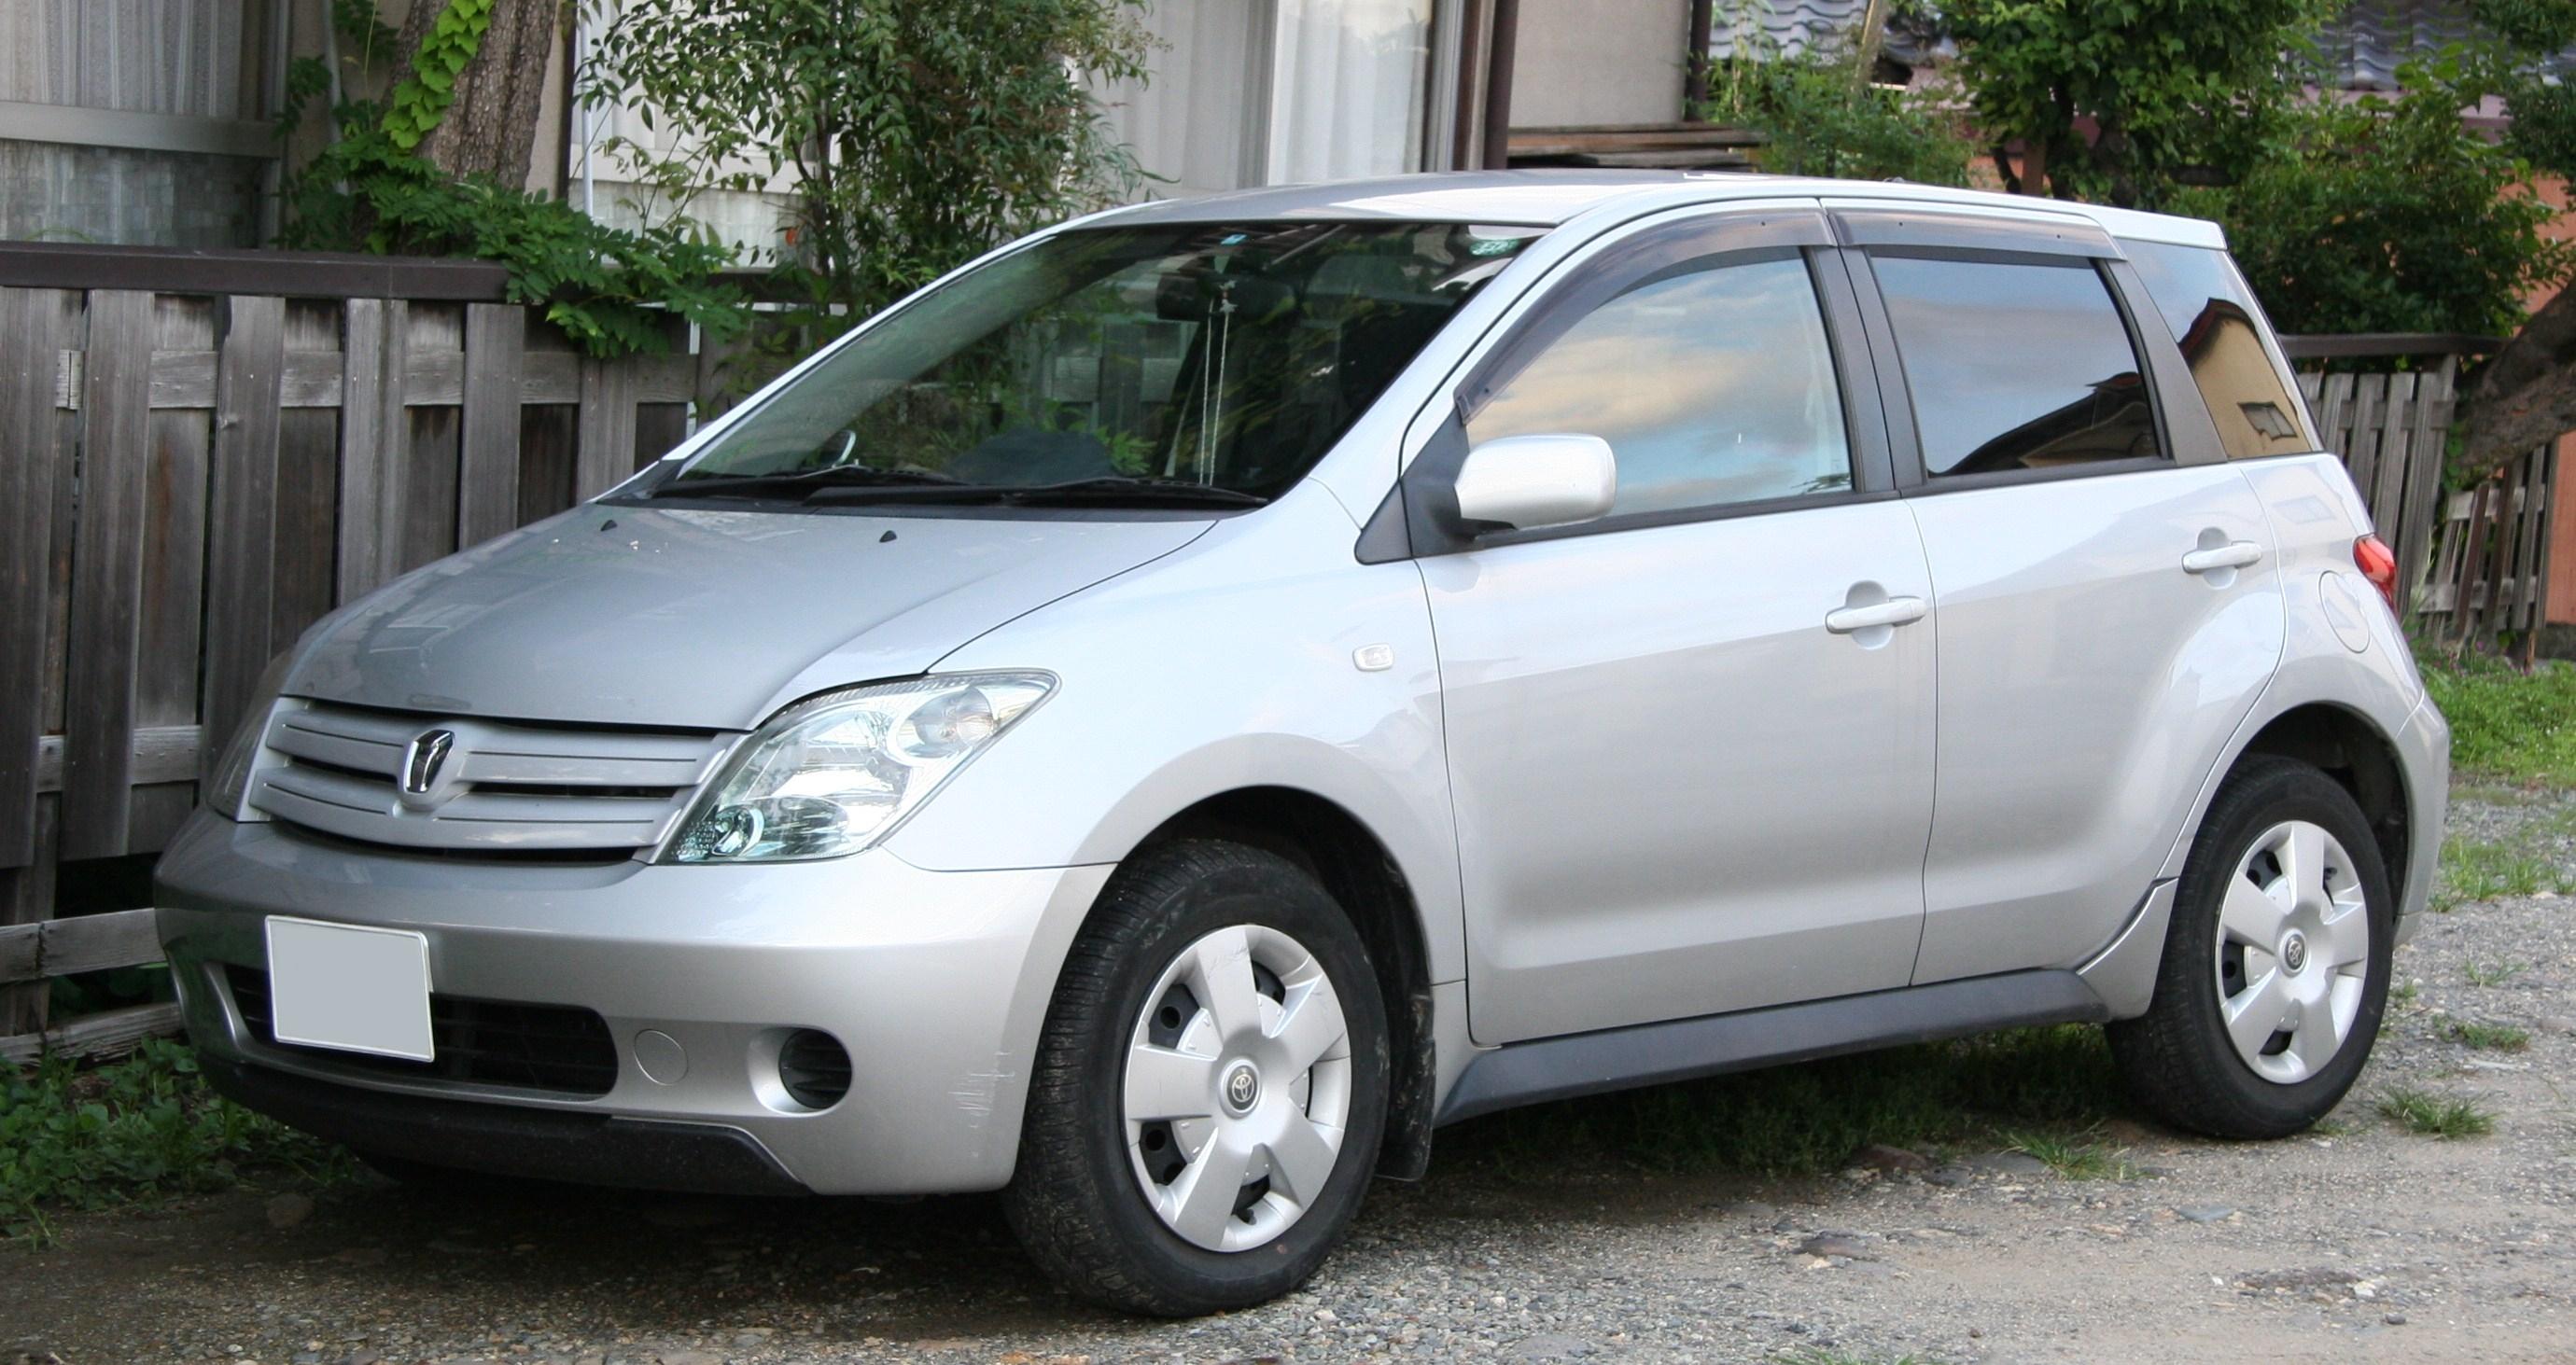 Kekurangan Toyota Ist 2005 Murah Berkualitas